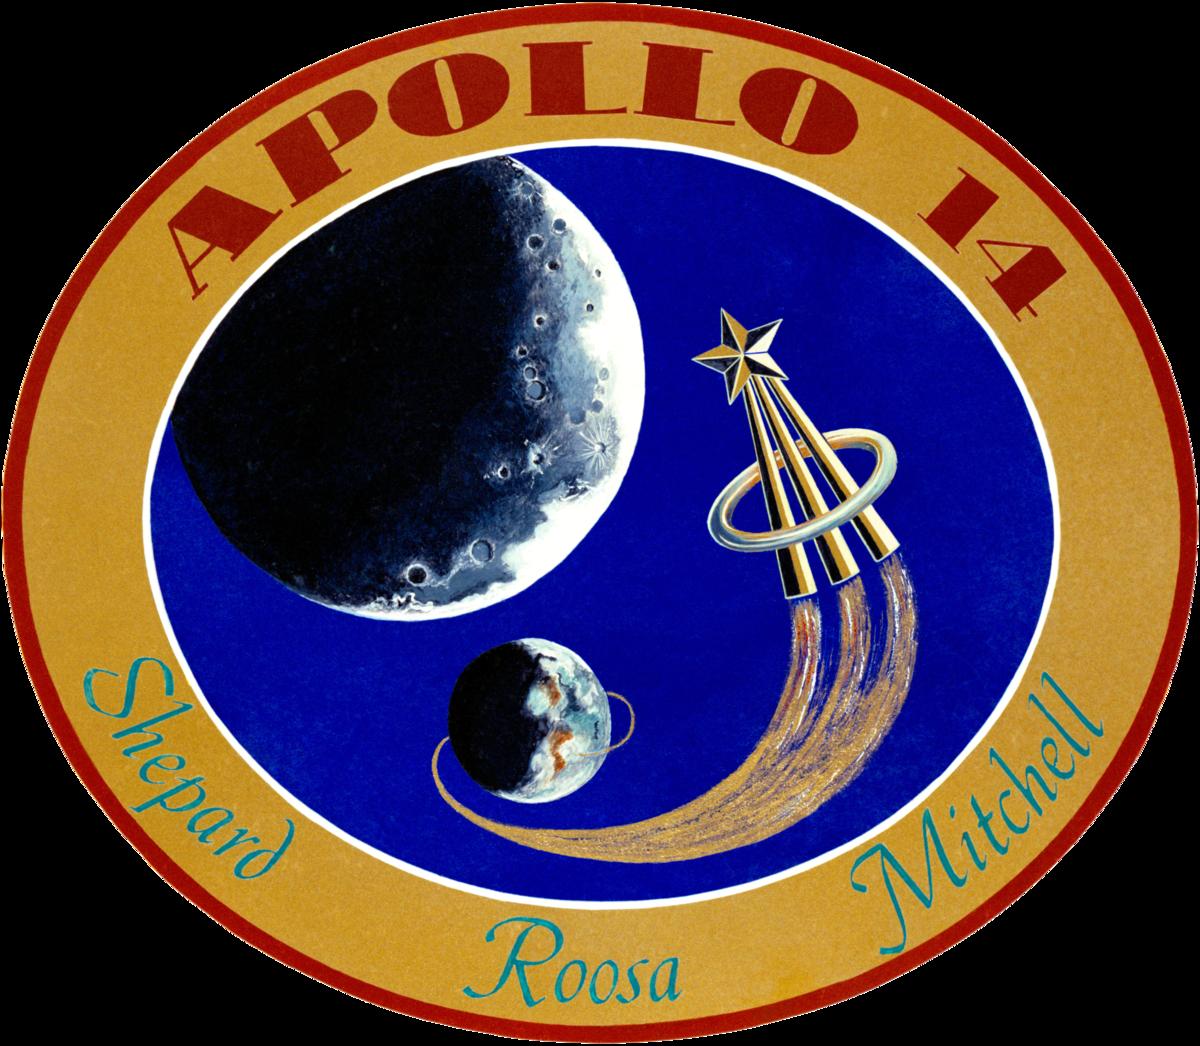 apollo space badges - photo #14